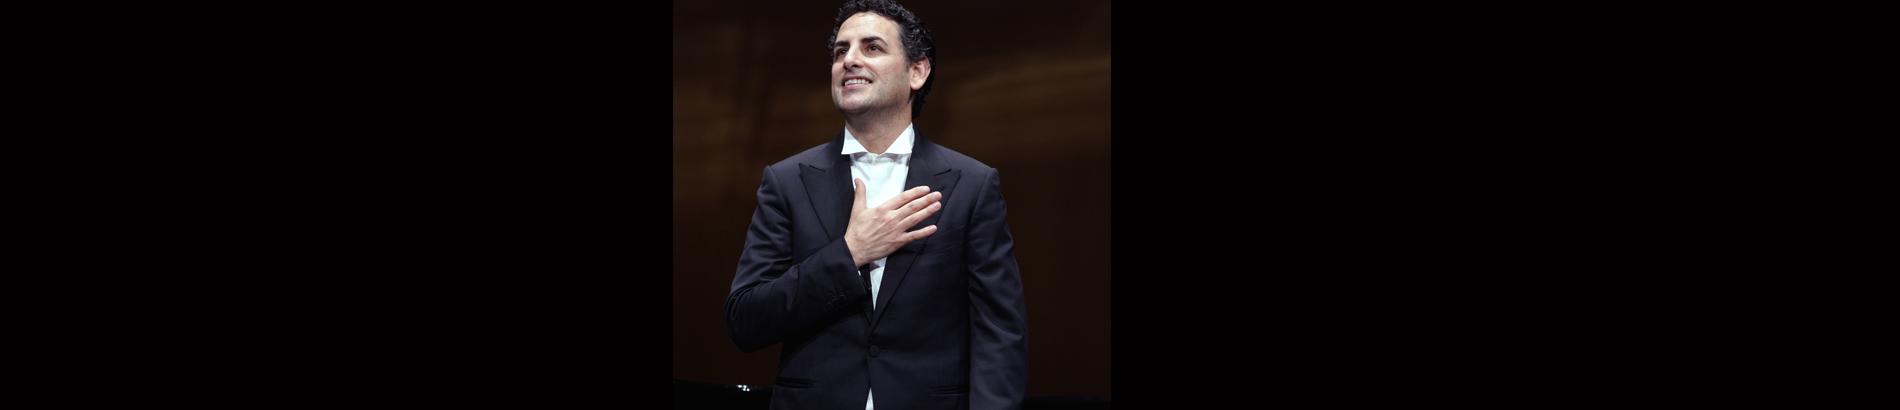 Sir Antonio Pappano conducts Mozart, Rossini, Donizetti, Offenbach, Puccini, and Verdi – With Juan Diego Flórez